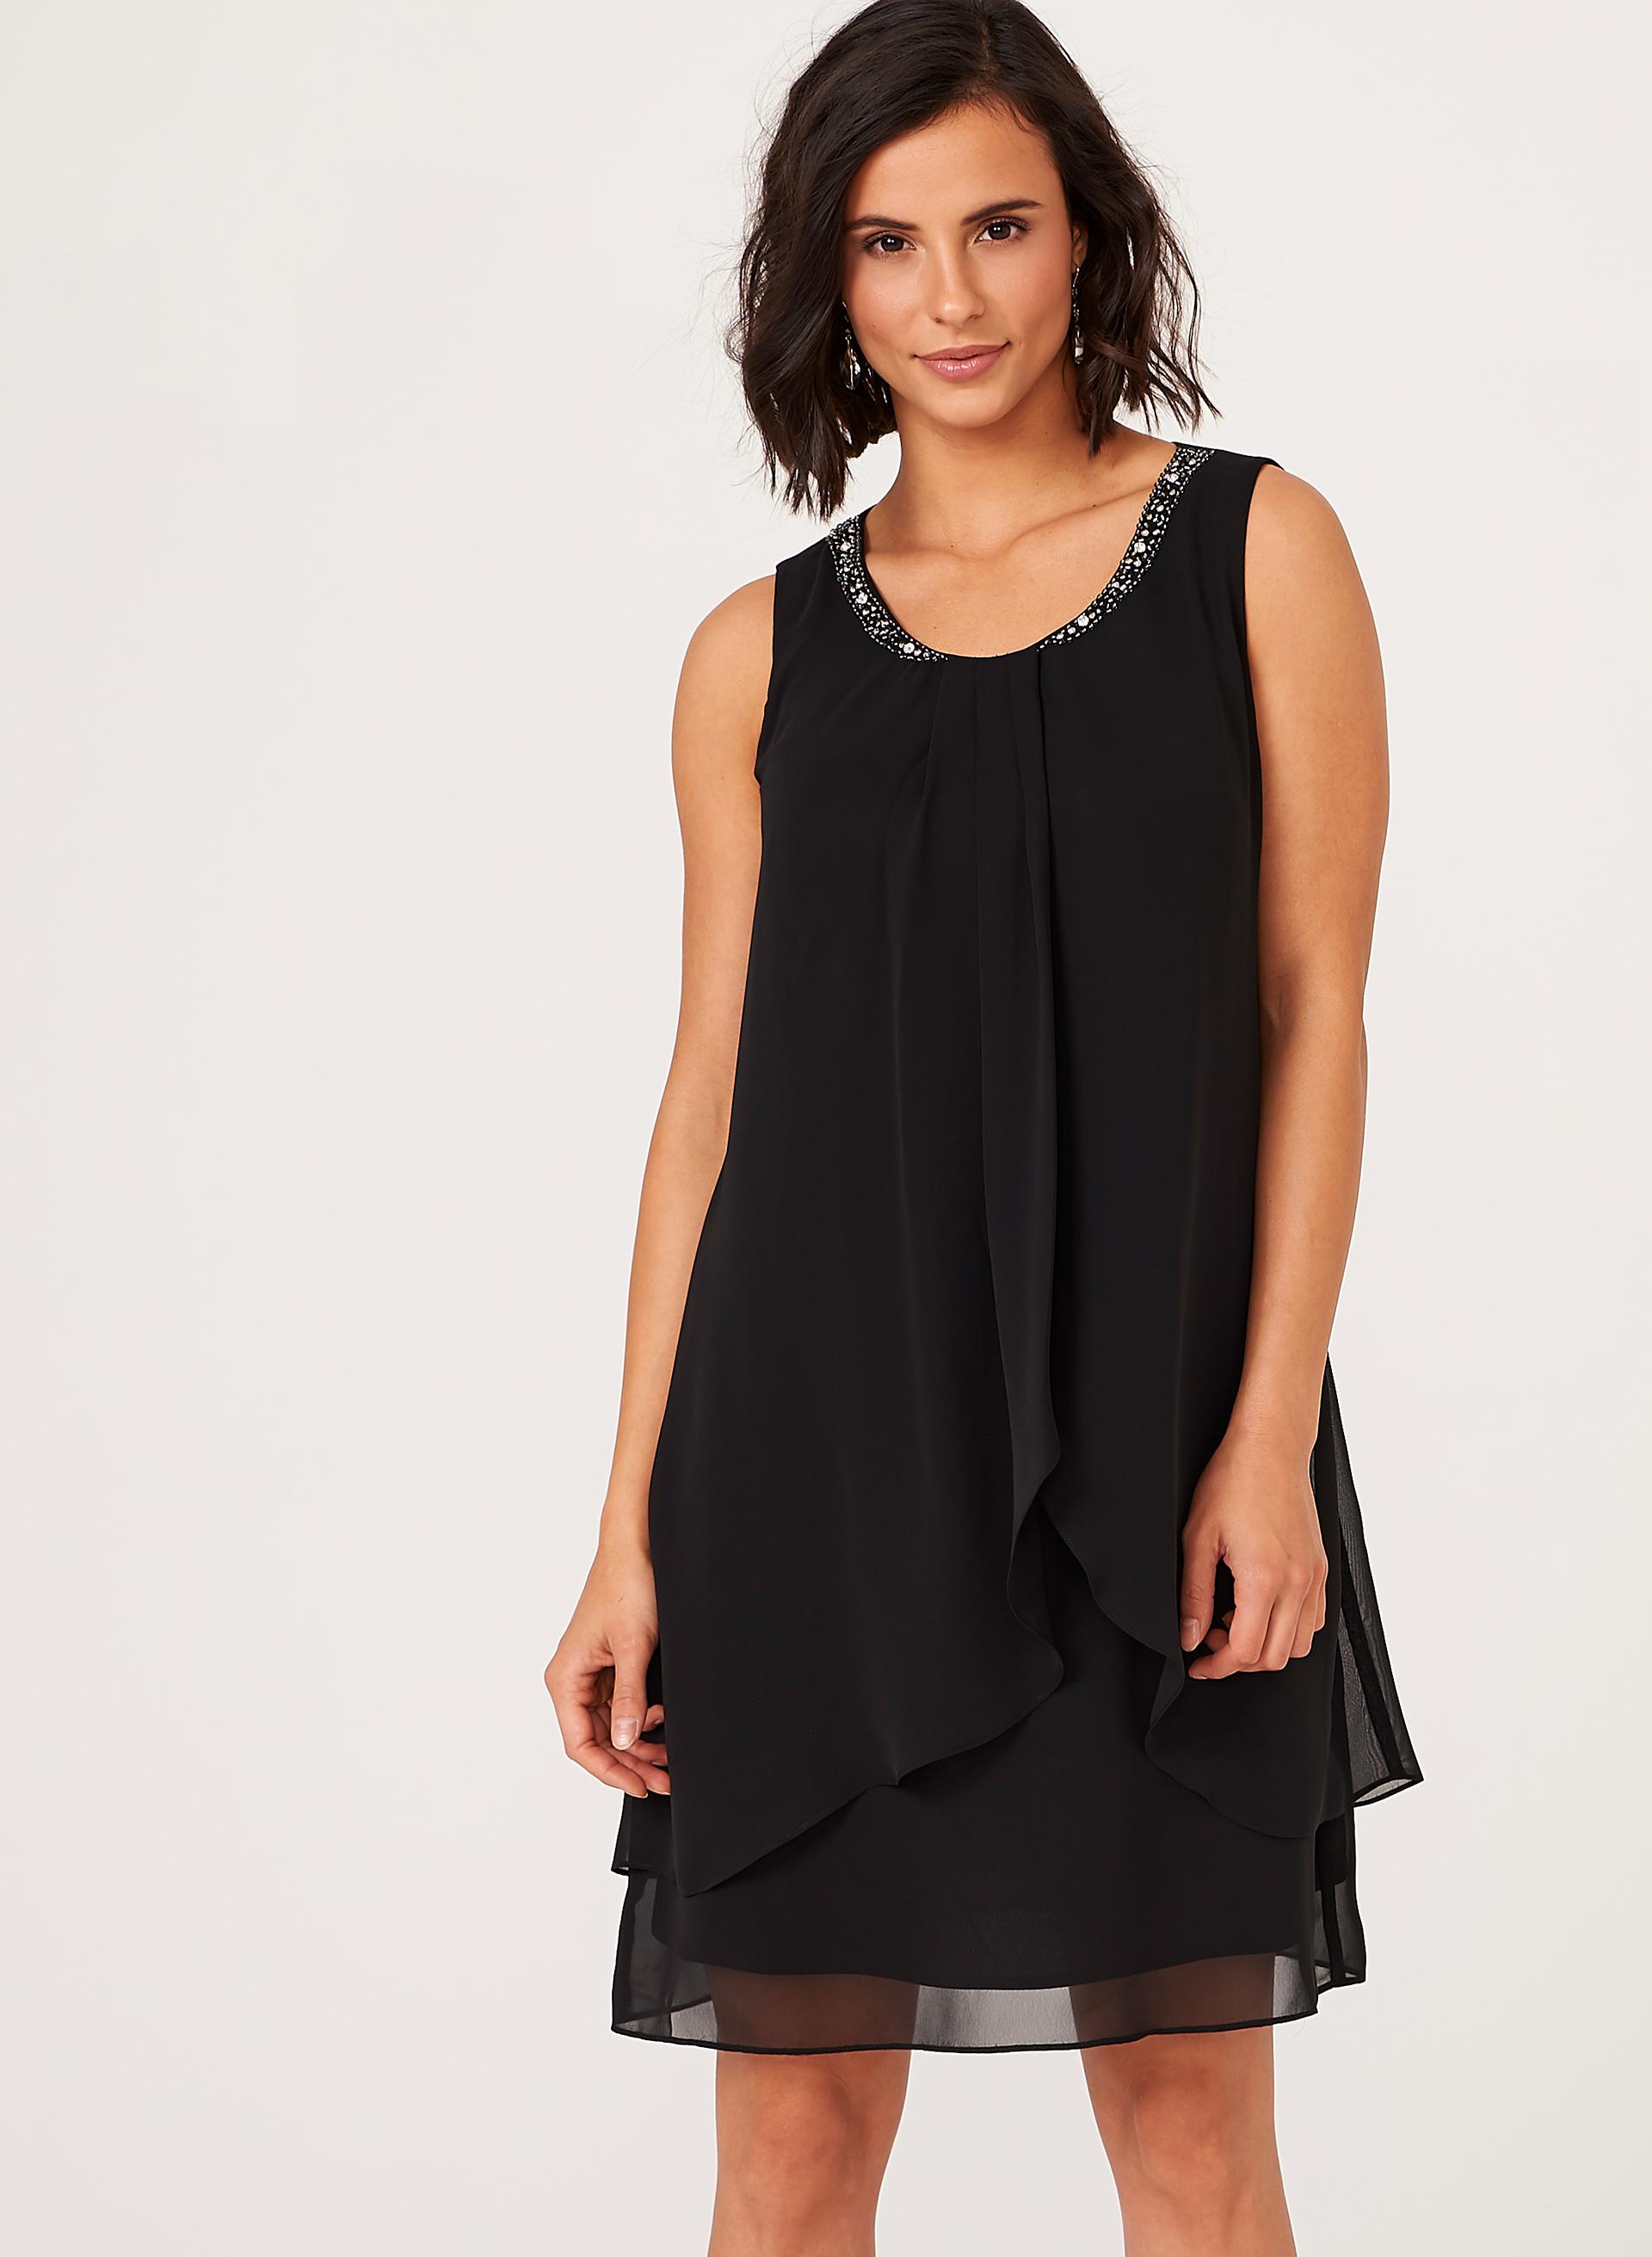 robe en mousseline avec col ornement laura. Black Bedroom Furniture Sets. Home Design Ideas